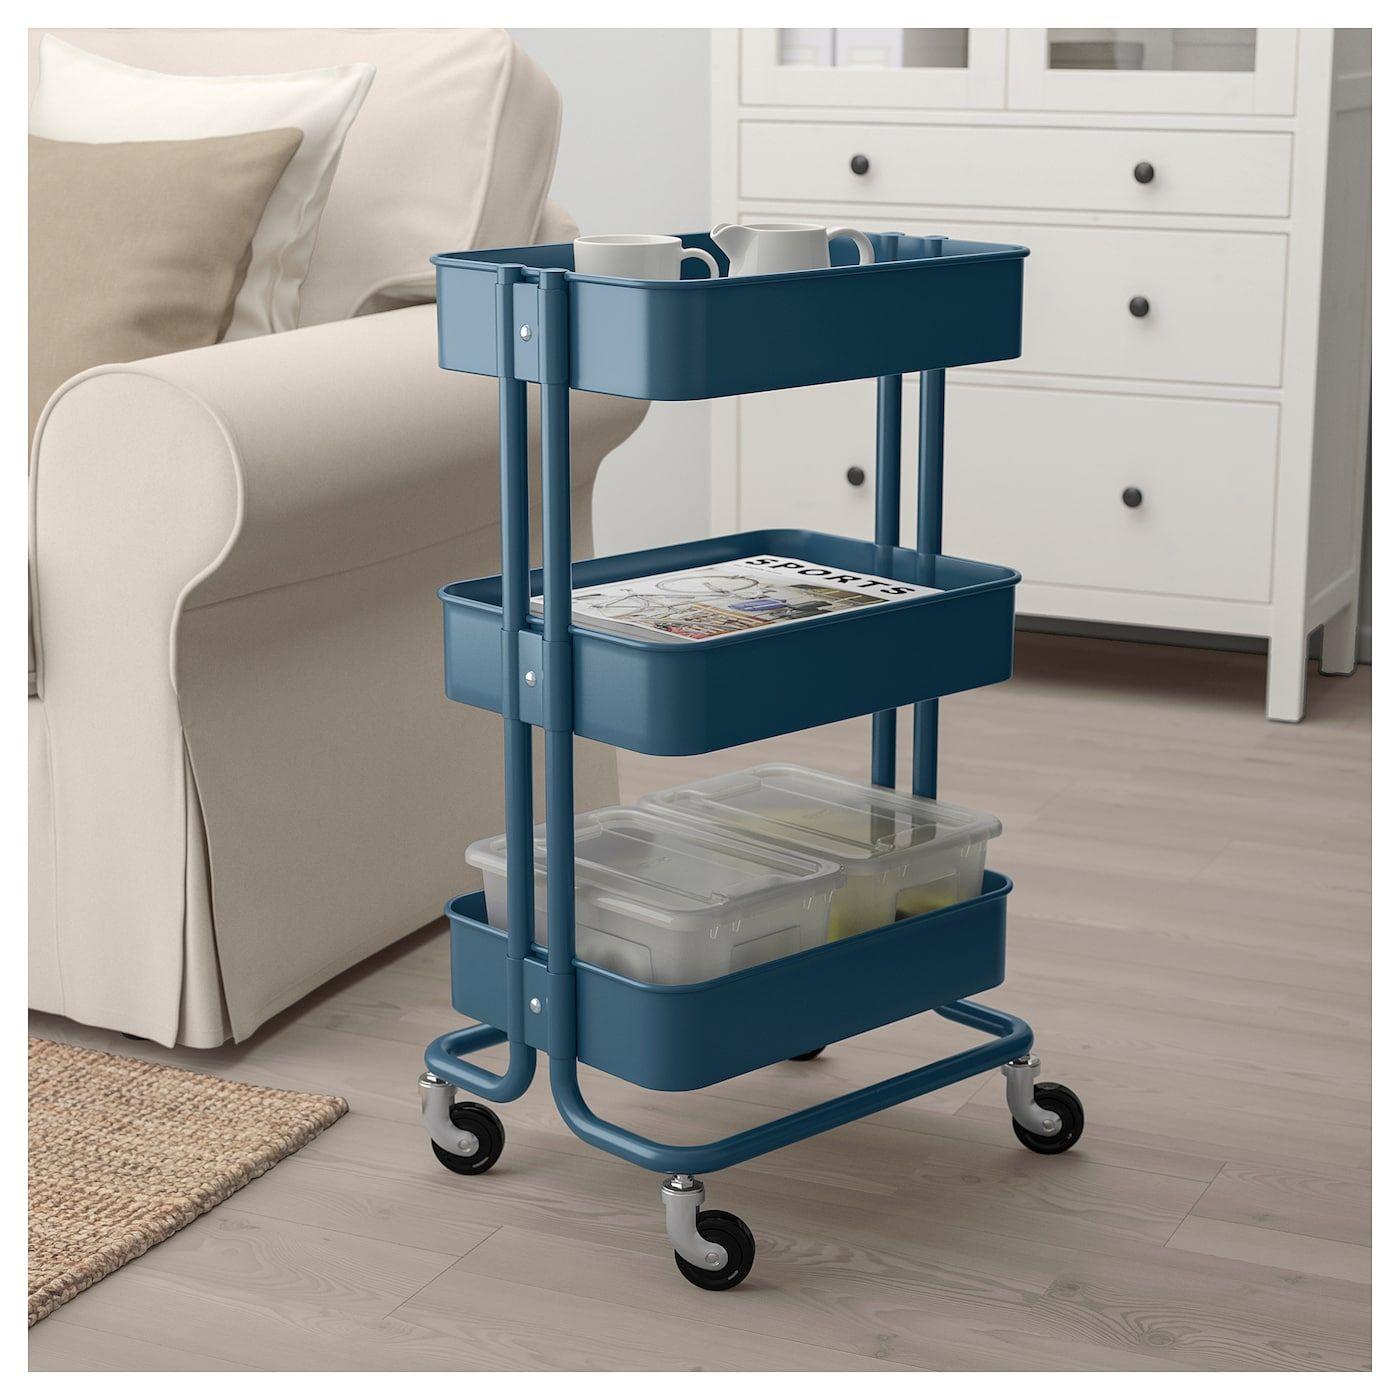 RÅSKOG Utility cart dark blue IKEA Utility cart